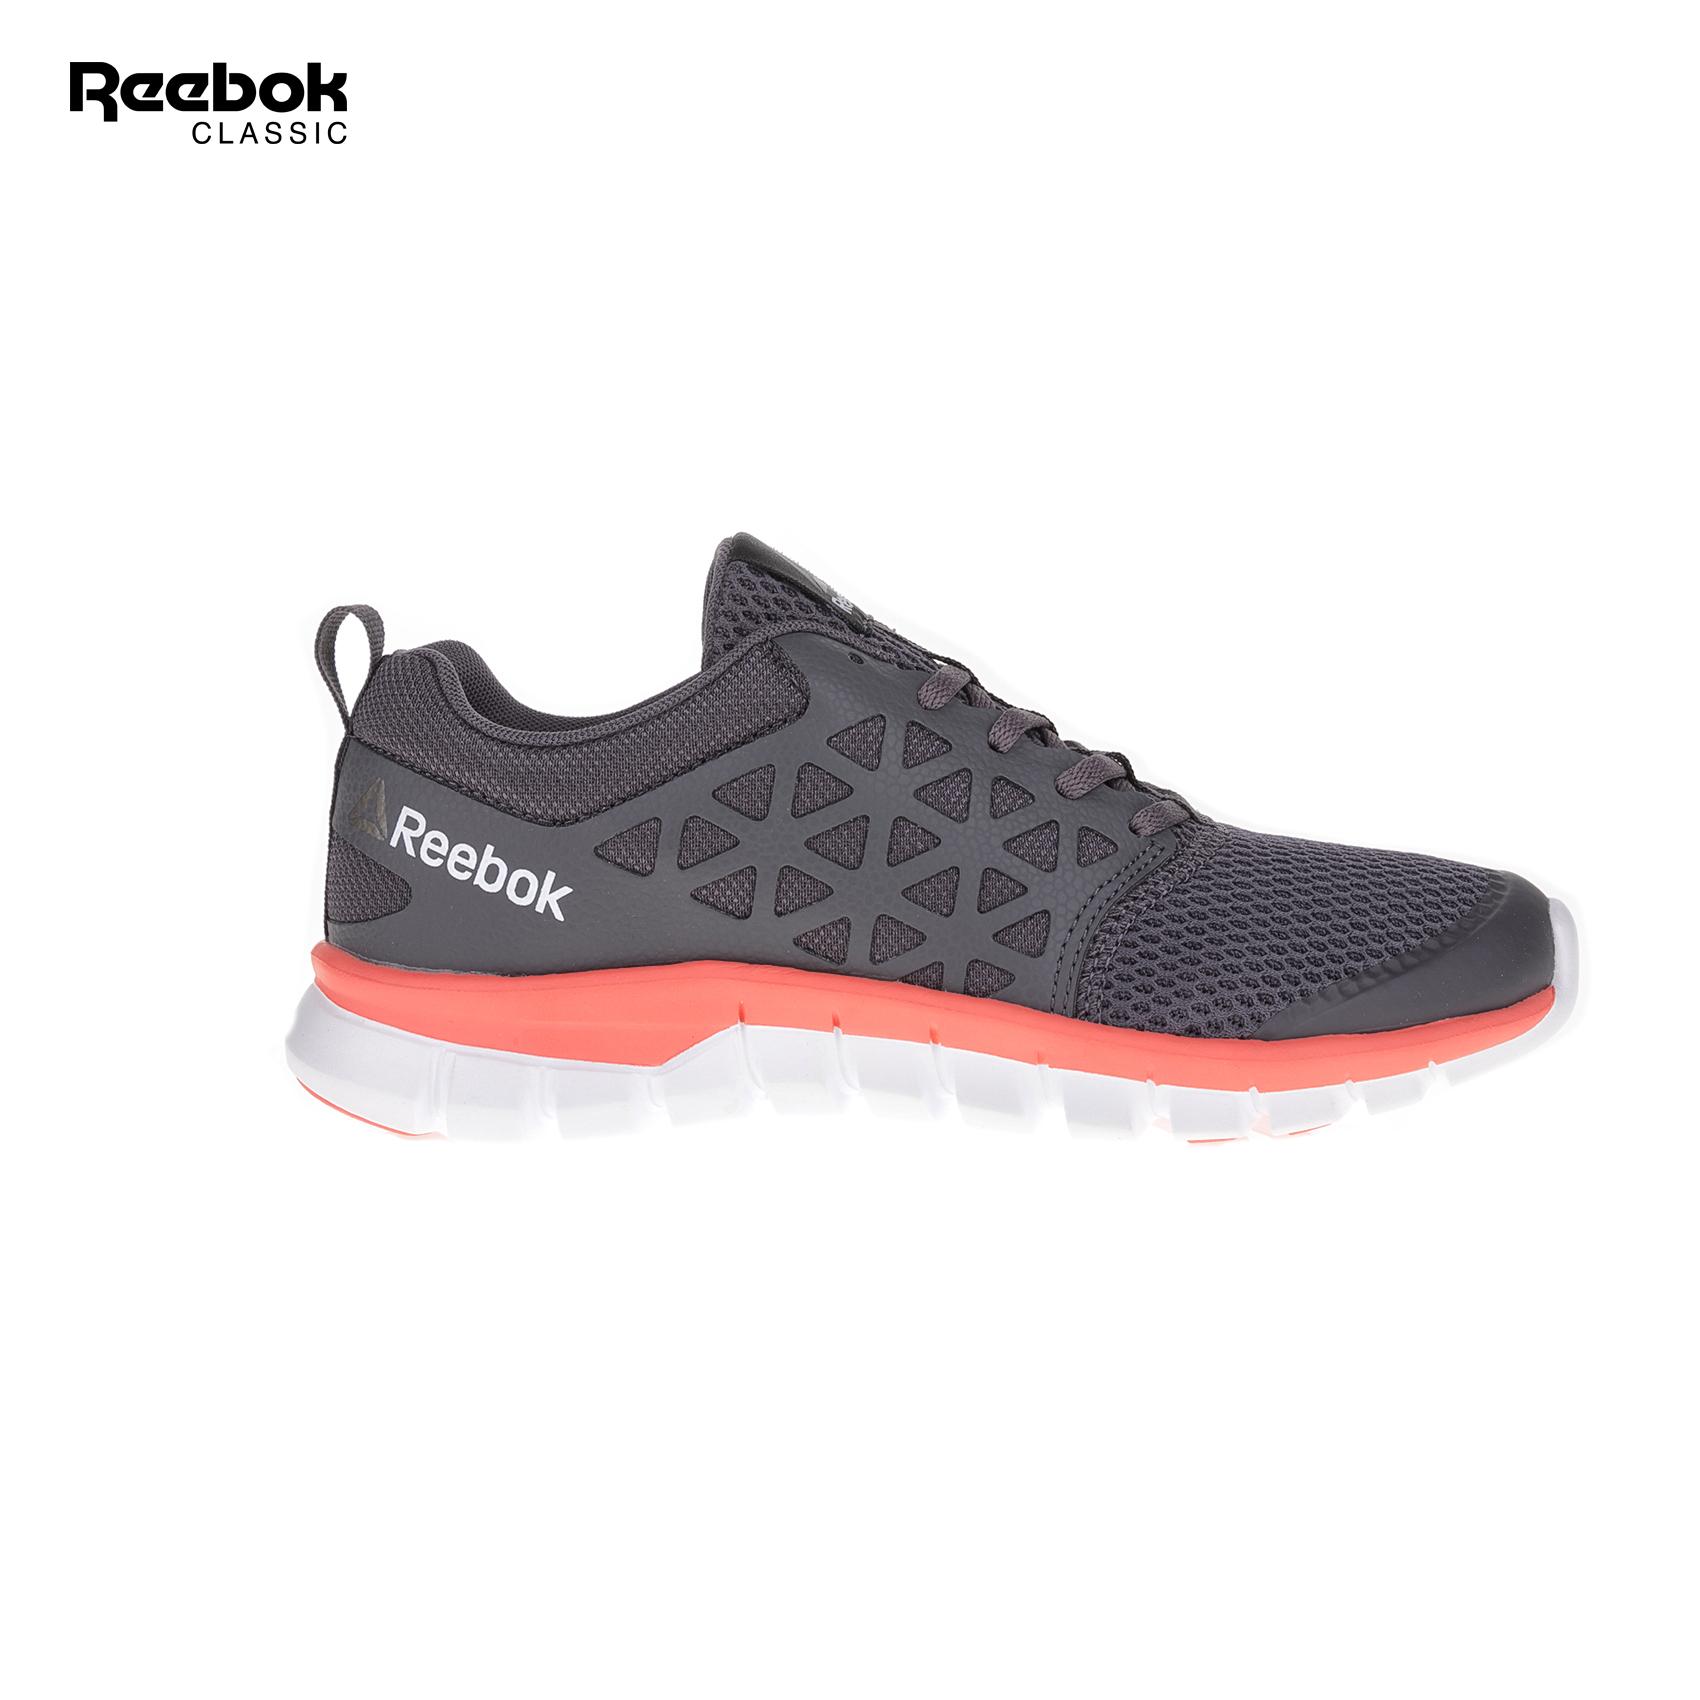 REEBOK CLASSIC – Γυναικεία παπούτσια για τρέξιμο REEBOK SUBLITE XT CUSHION 2.0 MT ροζ γκρι